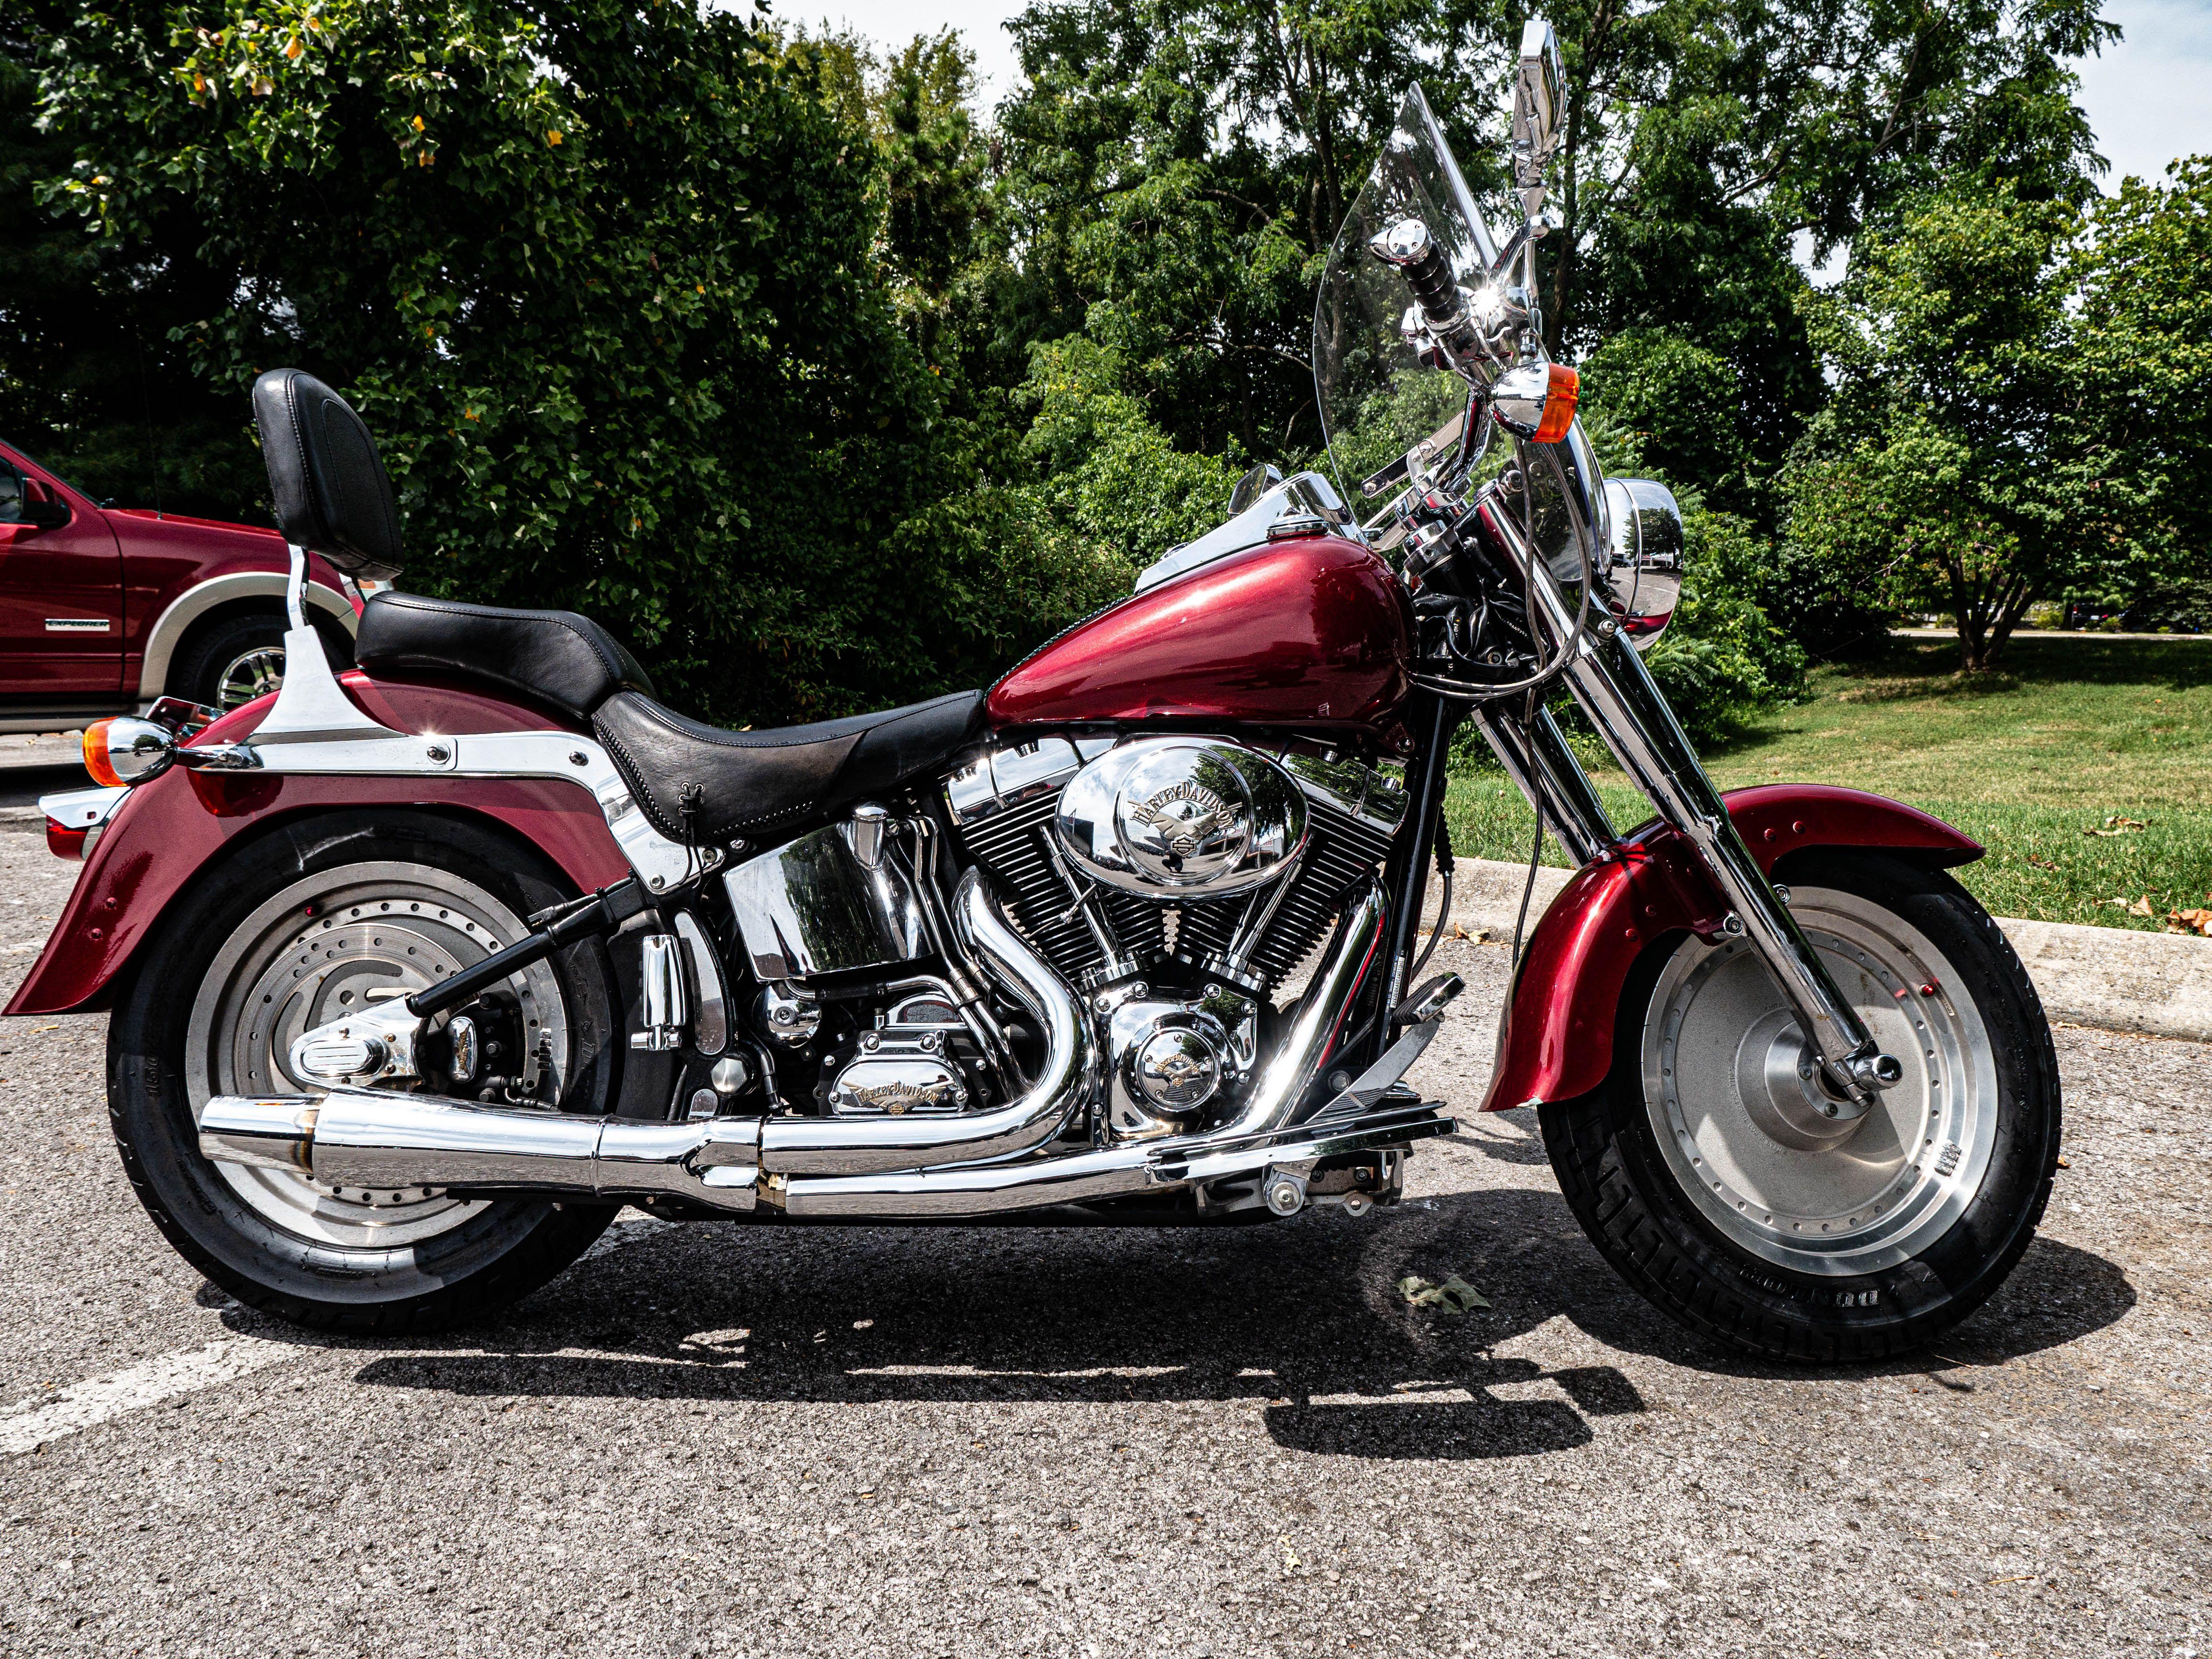 Pre-Owned 2000 Harley-Davidson Fat Boy